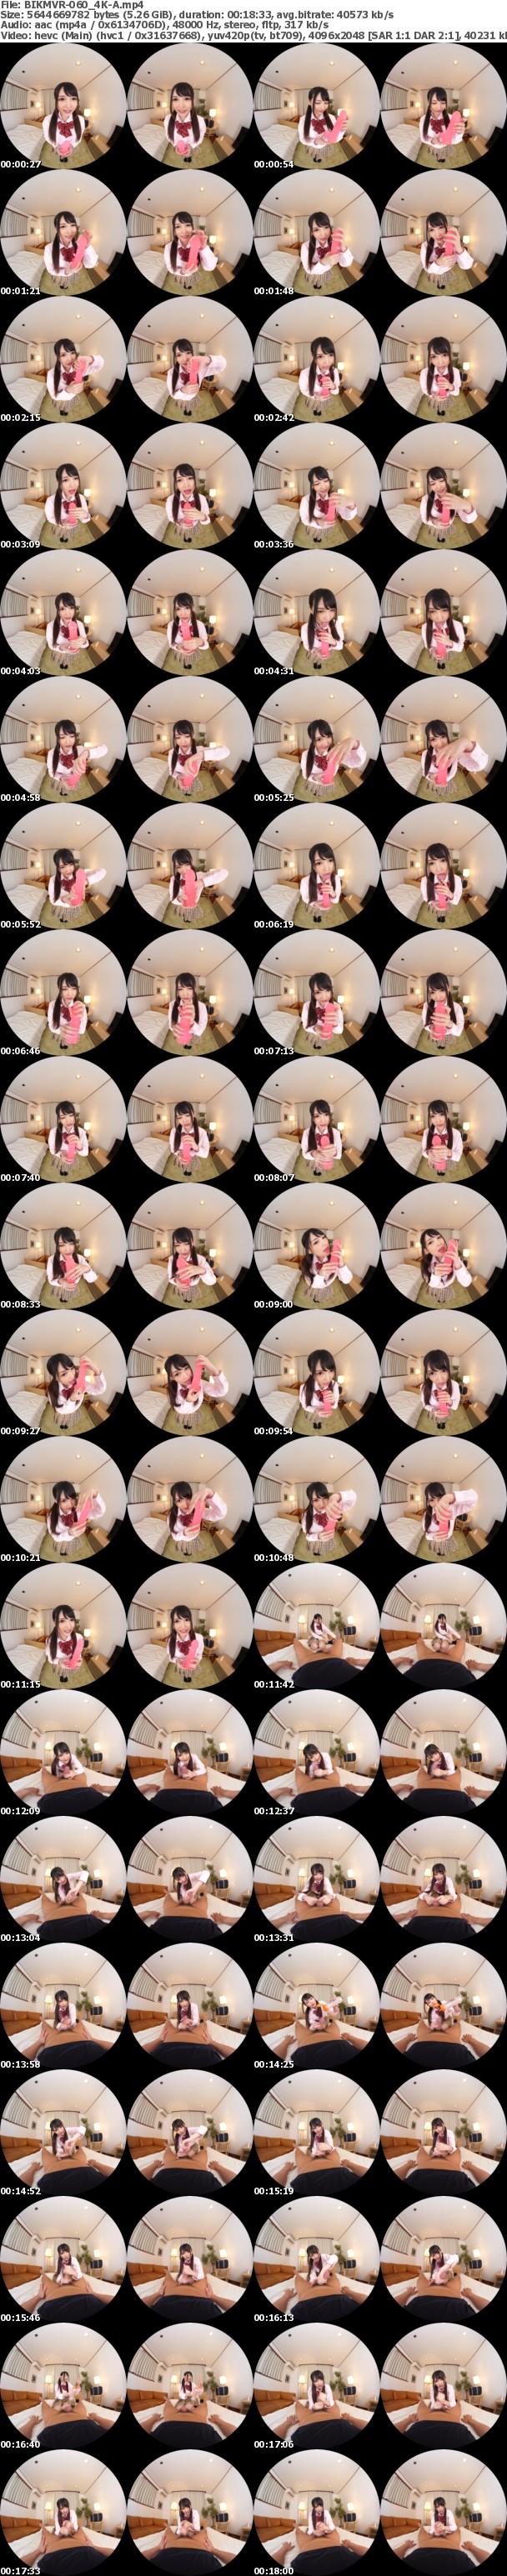 (VR) BIKMVR-060 【4K匠】絶頂射精 こねくりスペシャル'跡美しゅり'が腰が砕けるほどに絶頂射精に誘う!!めちゃくちゃ気持ちいい絶頂射精3発射!!3中出し!!